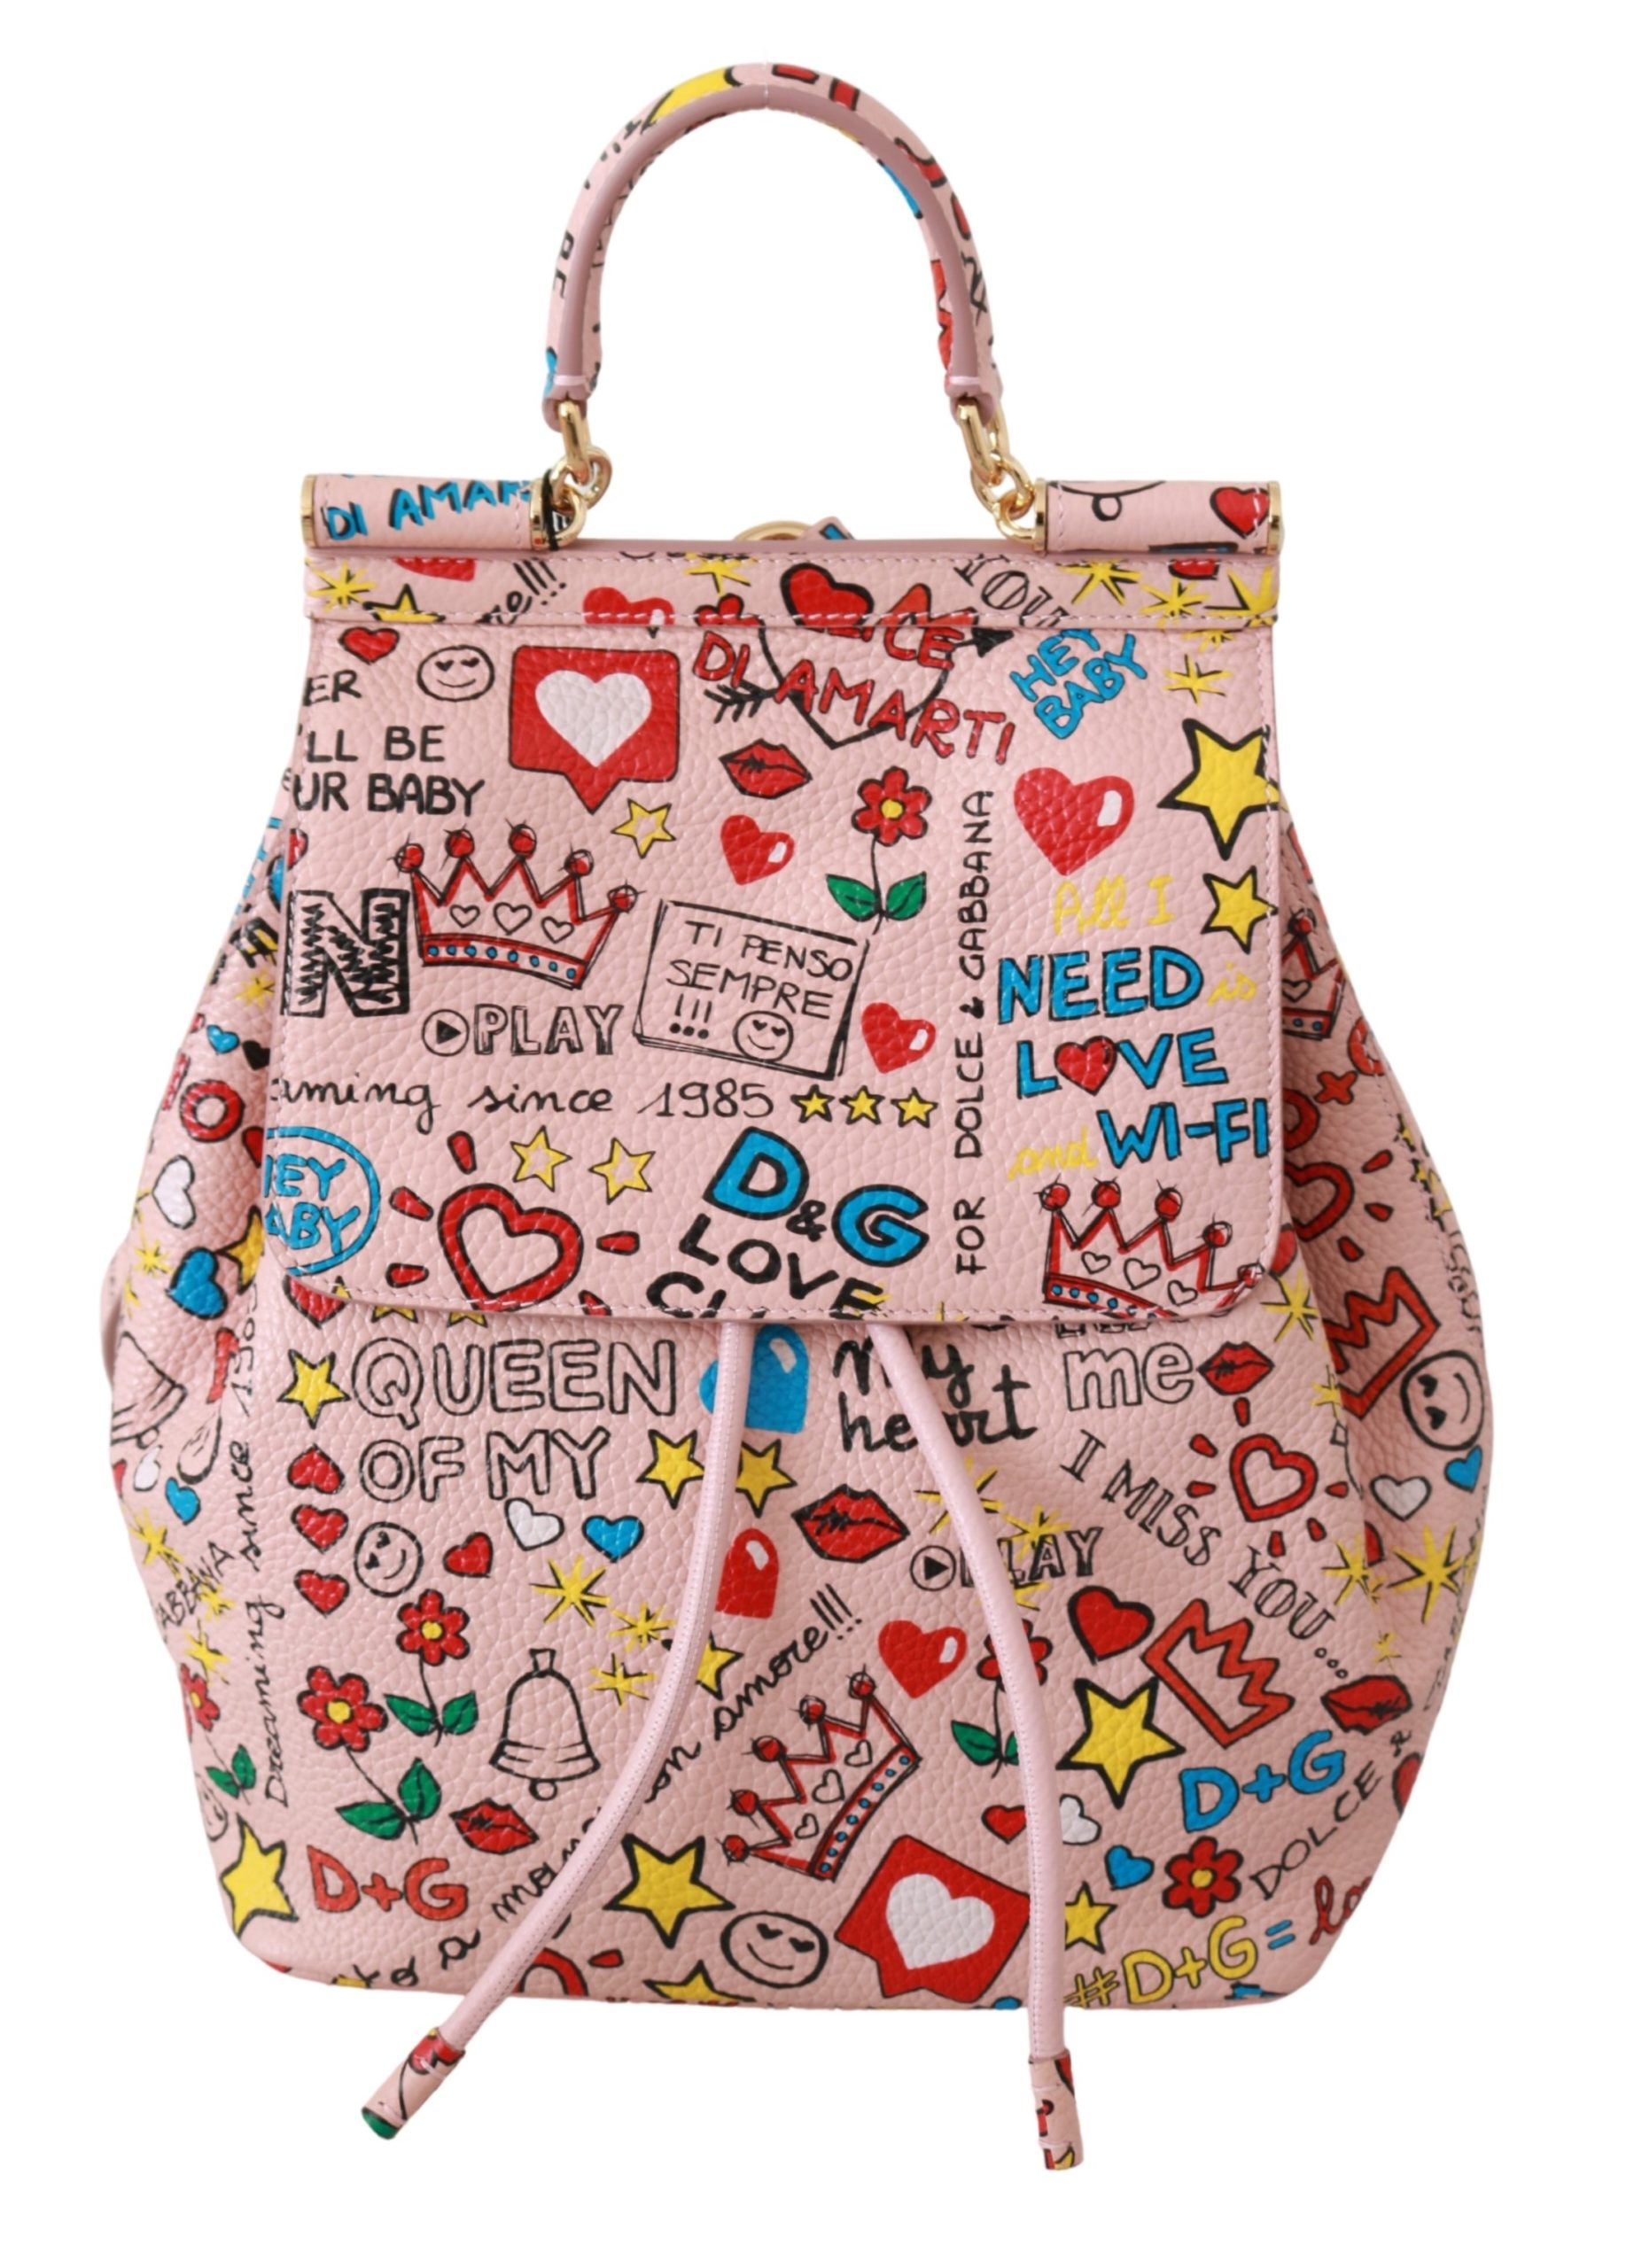 Dolce & Gabbana Women's Leather Backpack Pink VAS9228